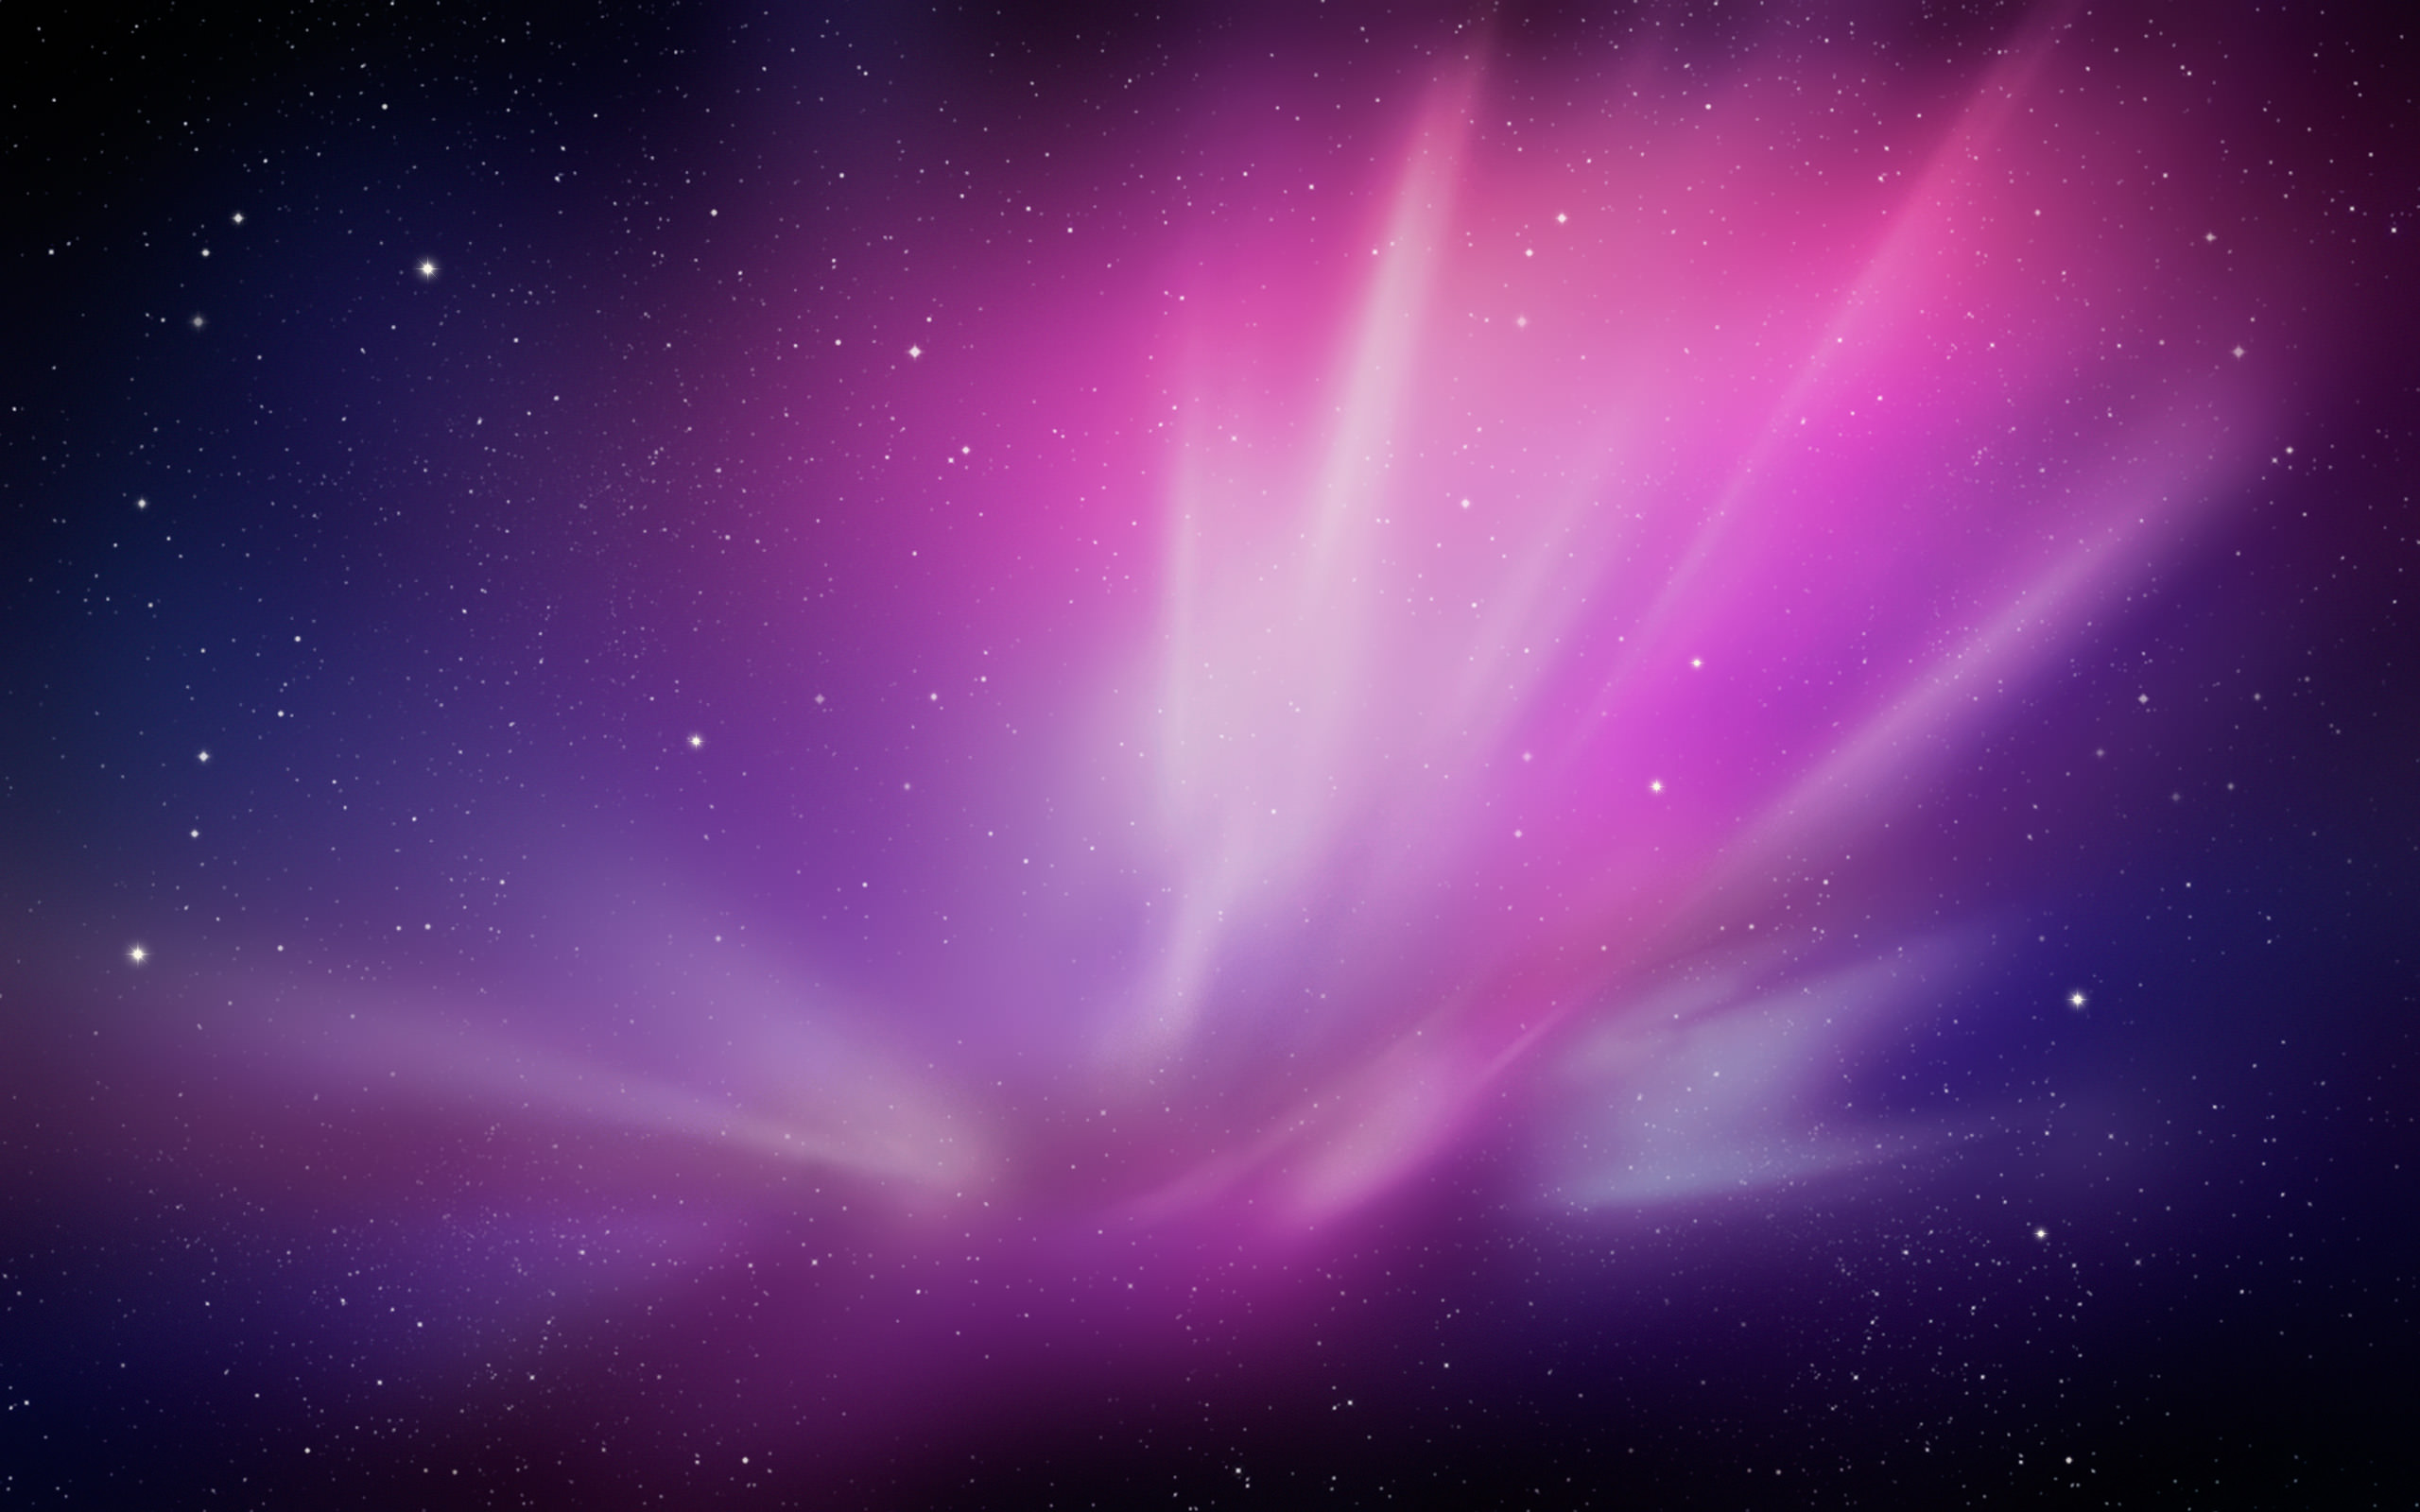 10 beautiful mac os hd wallpaper and macbook pro retina